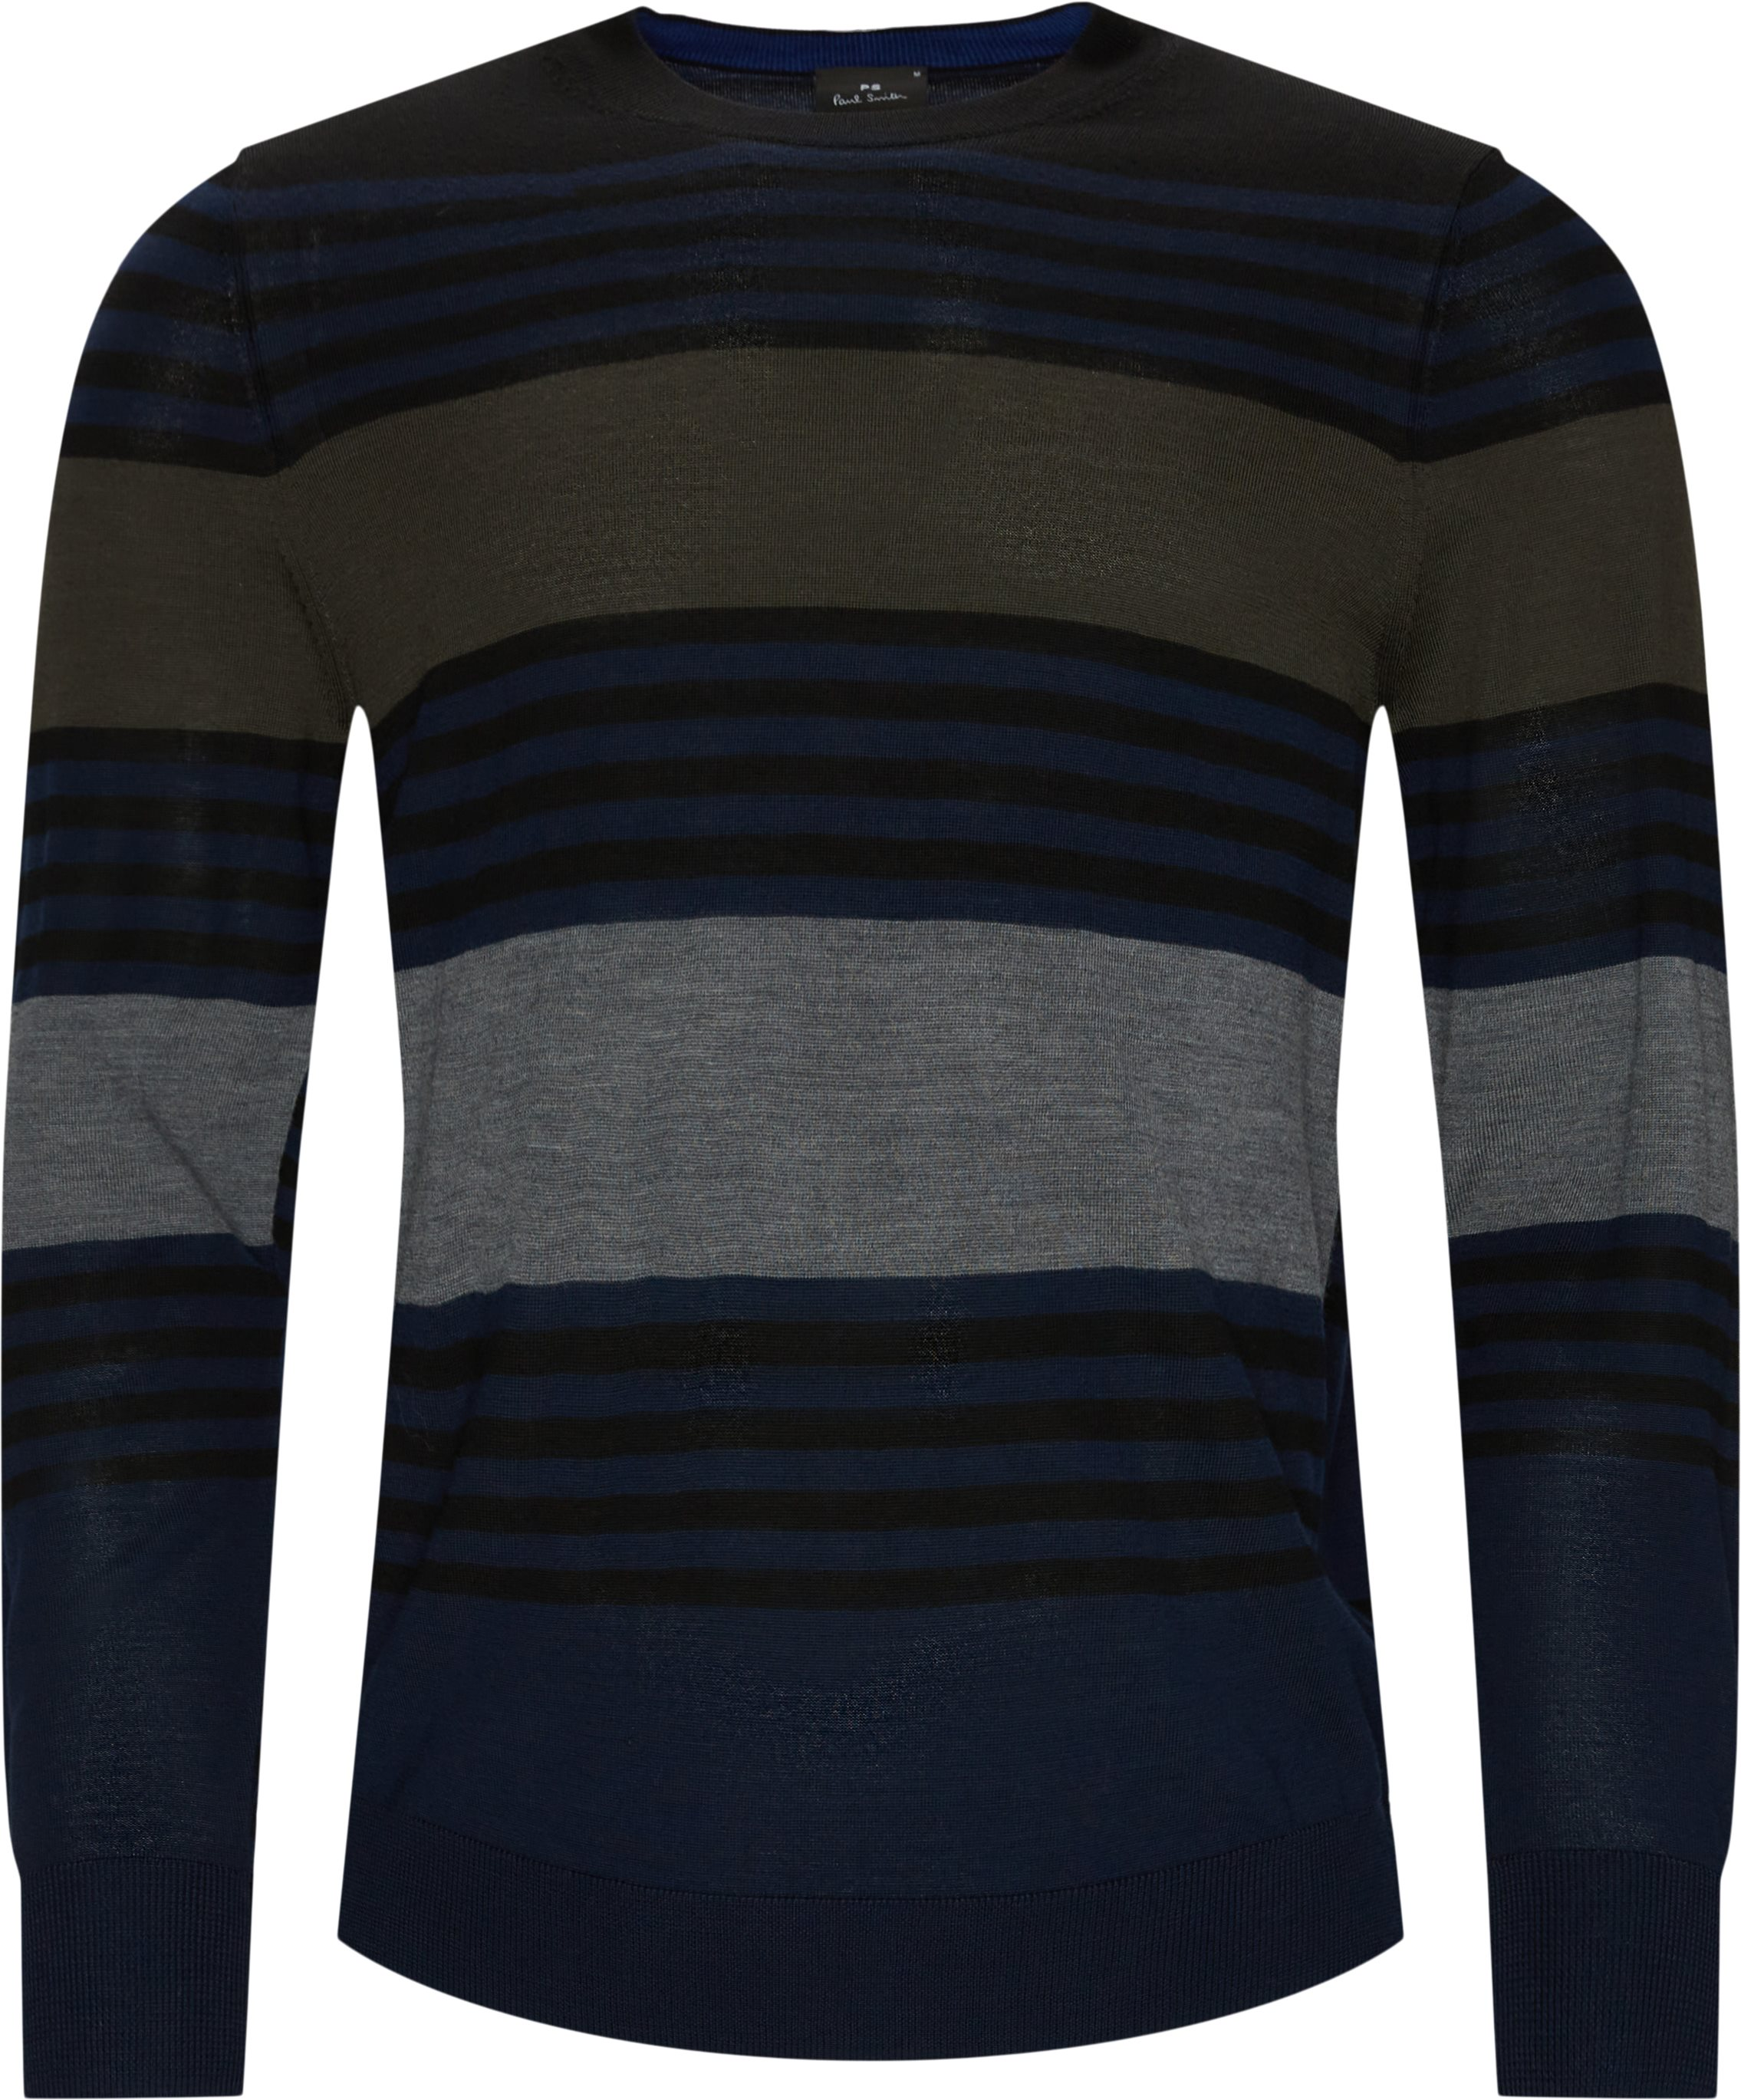 Merino Knit - Strik - Regular fit - Sort